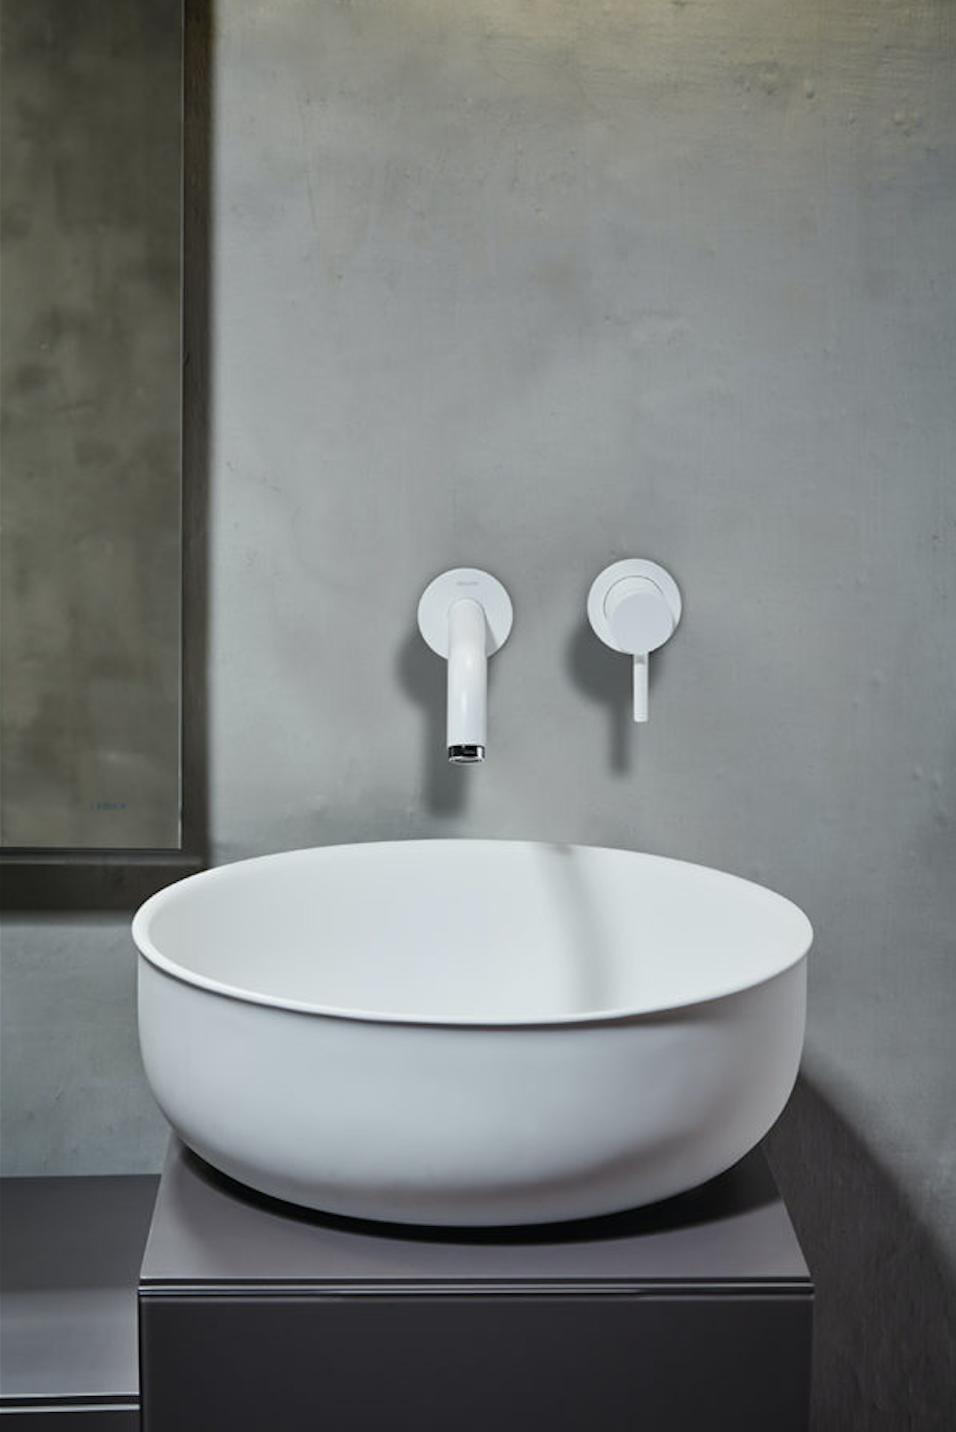 A Nostalgic Bath Collection from a Copenhagen Design Firm Inbani for Norm Architects Prime Sink